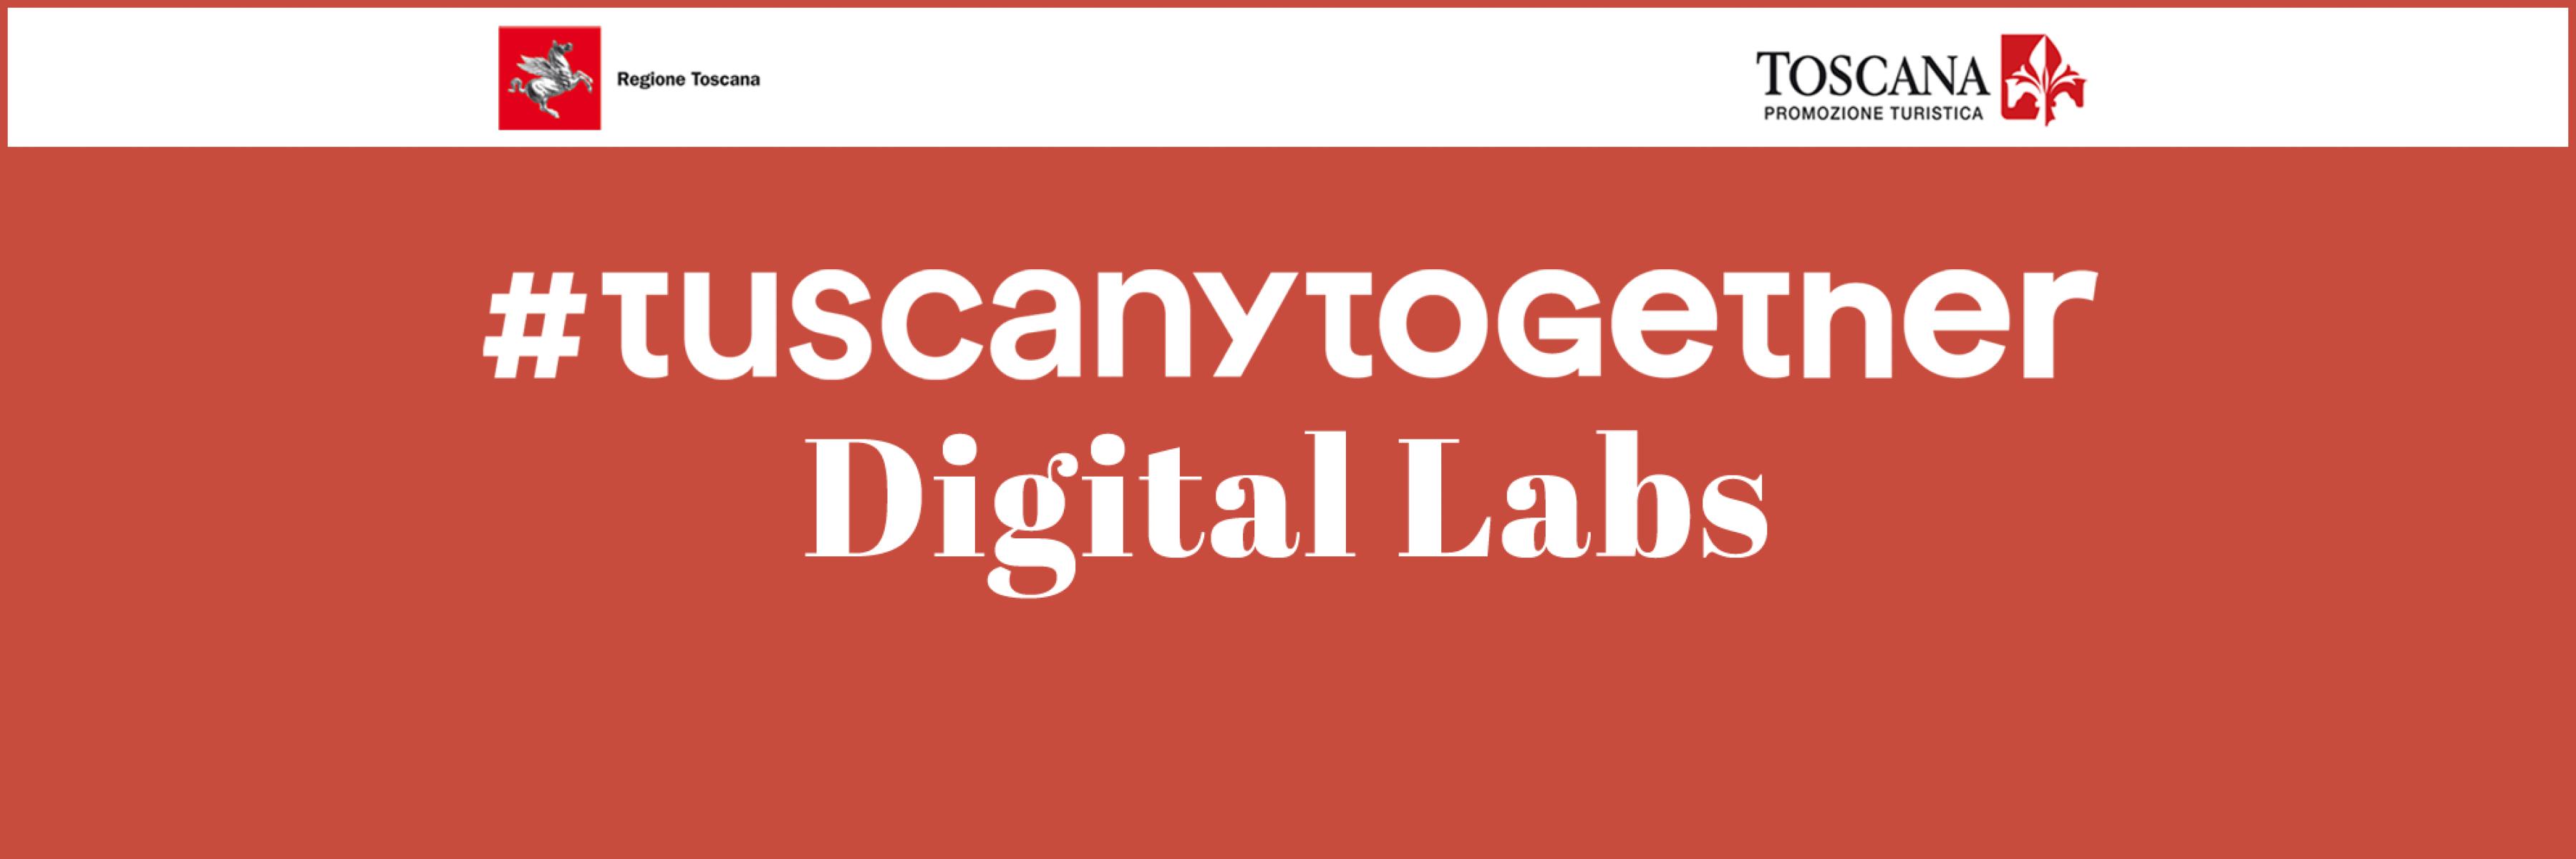 news-digital-labs